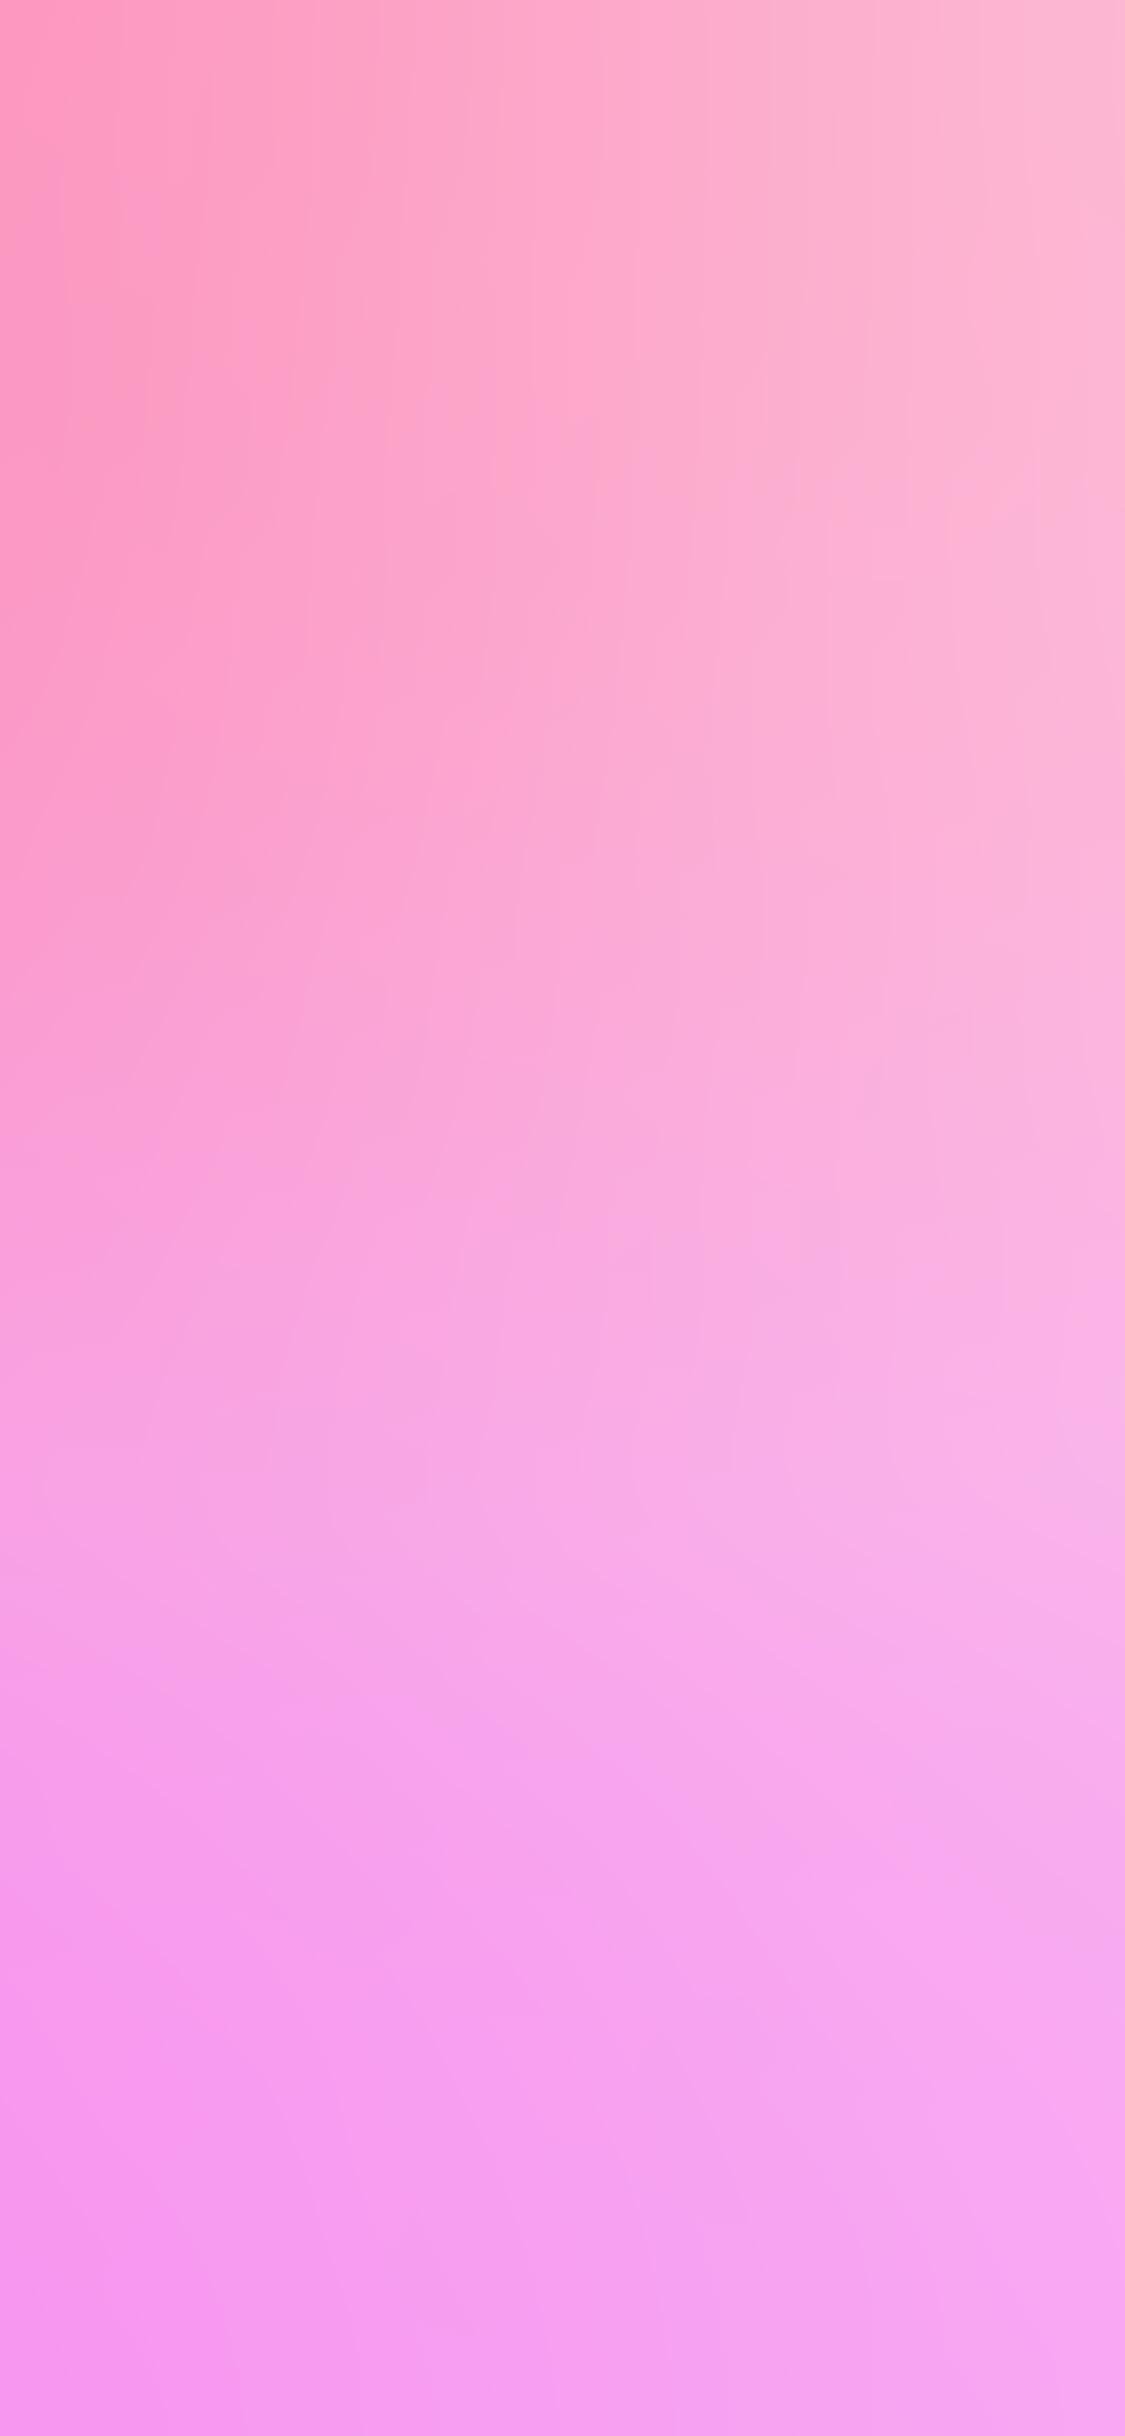 So14 Purple Pink Pastel Soft Blur Gradation Wallpaper